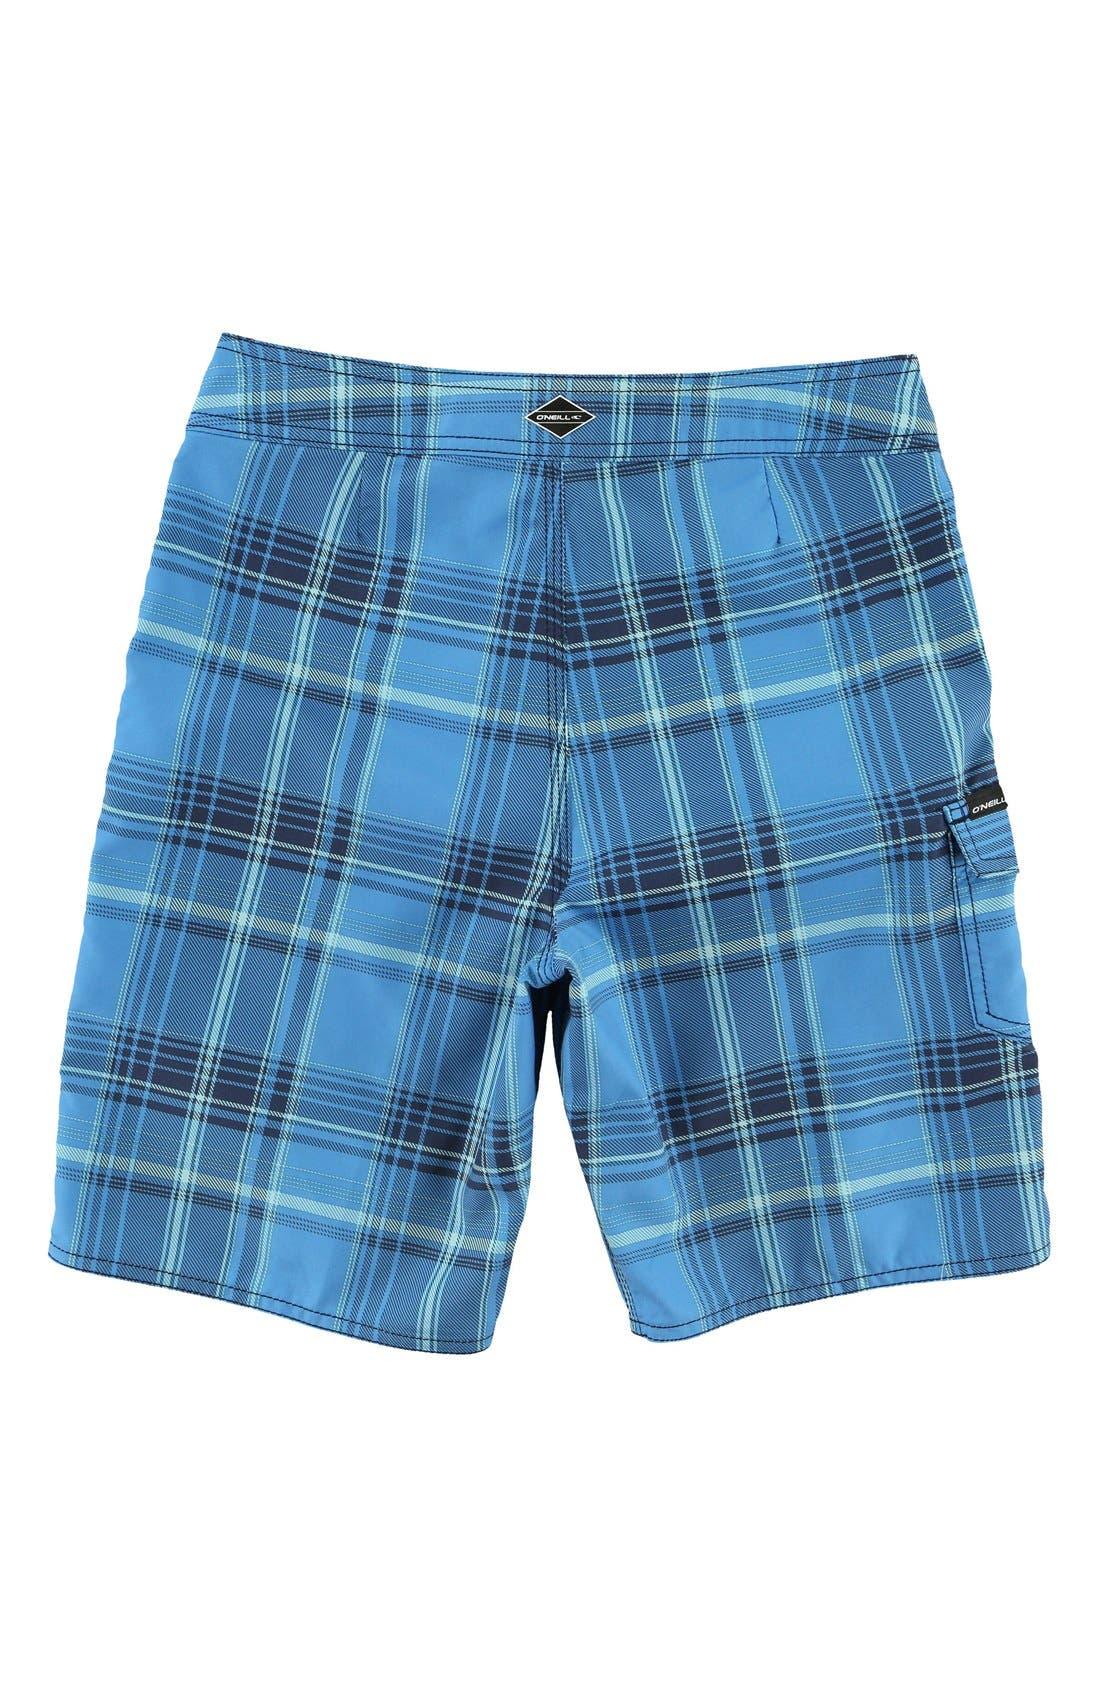 Alternate Image 2  - O'Neill Santa Cruz Plaid Board Shorts (Big Boys)